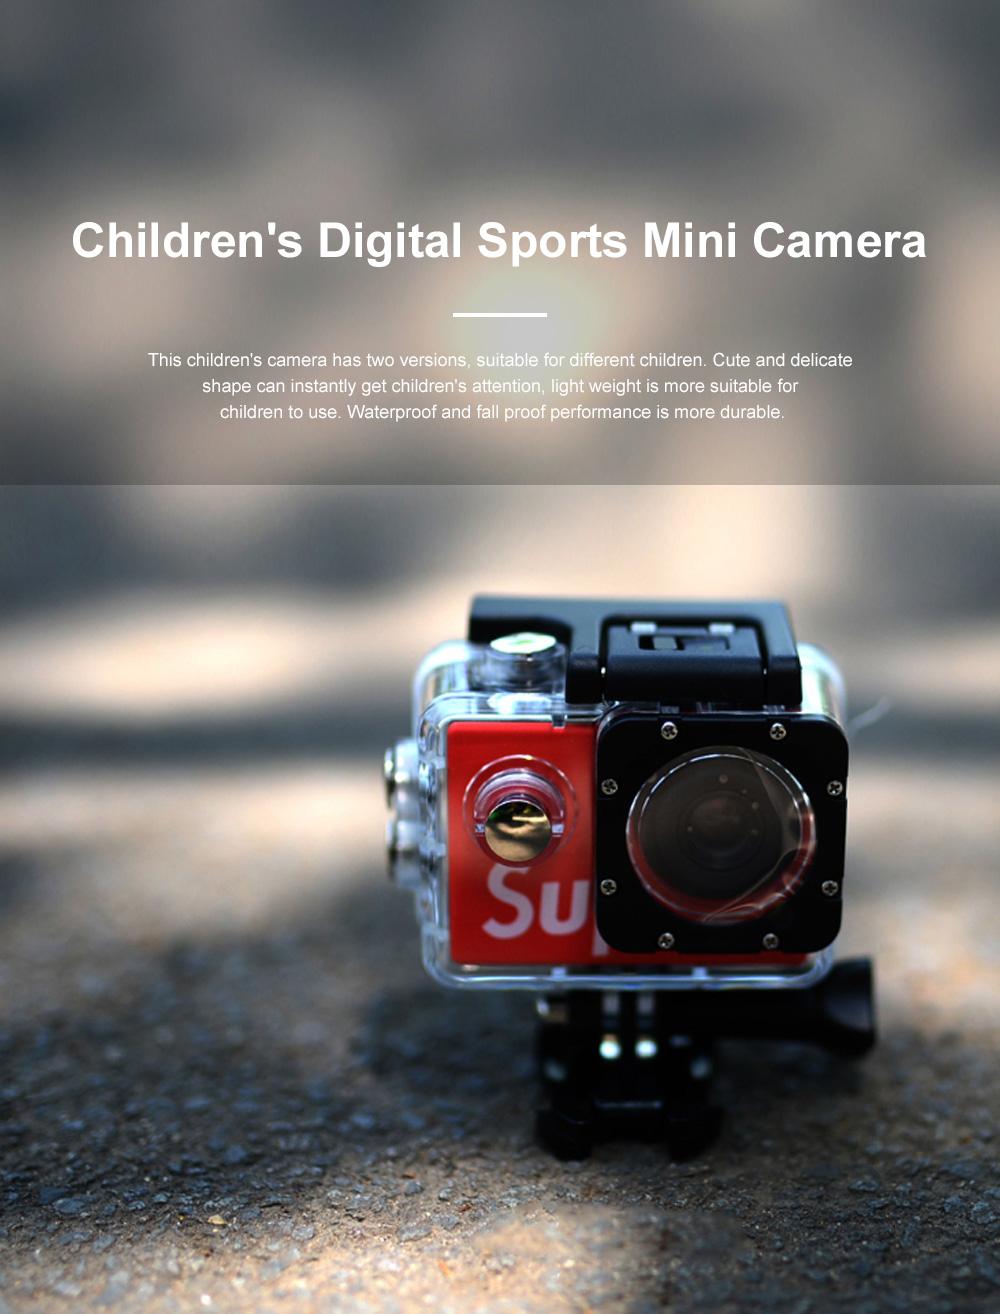 Children's 2.0 LCD Digital Mini Sports Camera 4K High Definition Waterproof and Fall Proof Camera Christmas Kids Gift 0